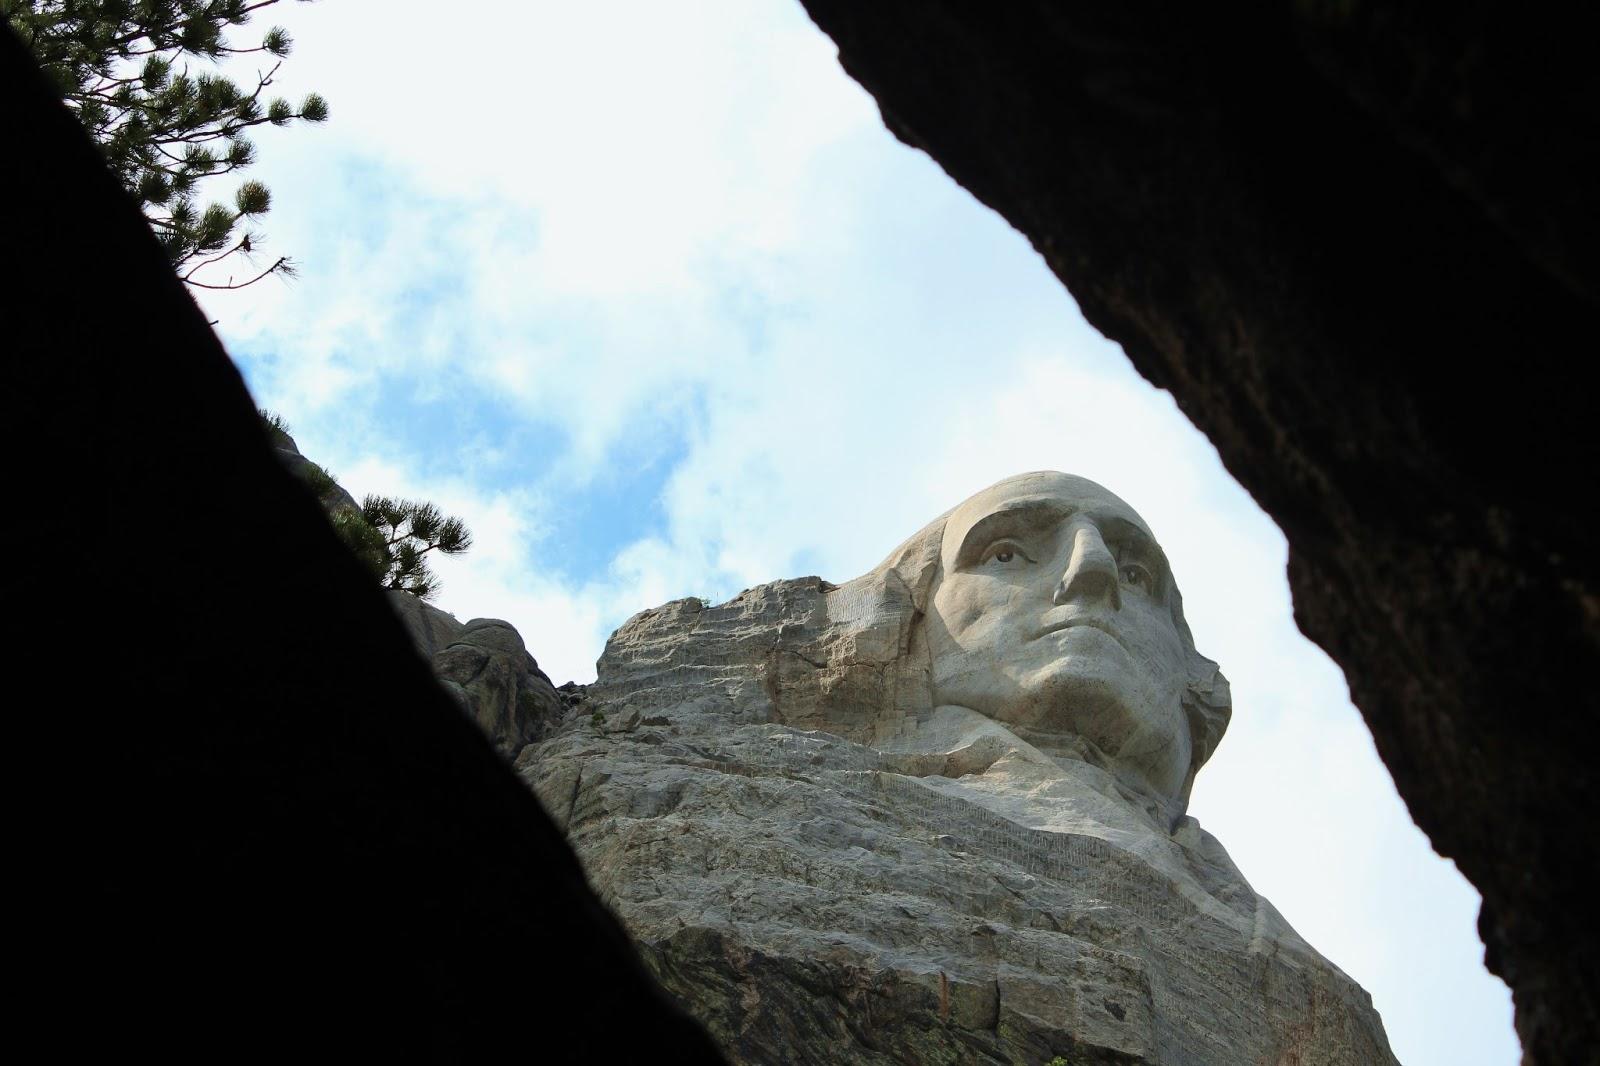 Artteajannell Mount Rushmore